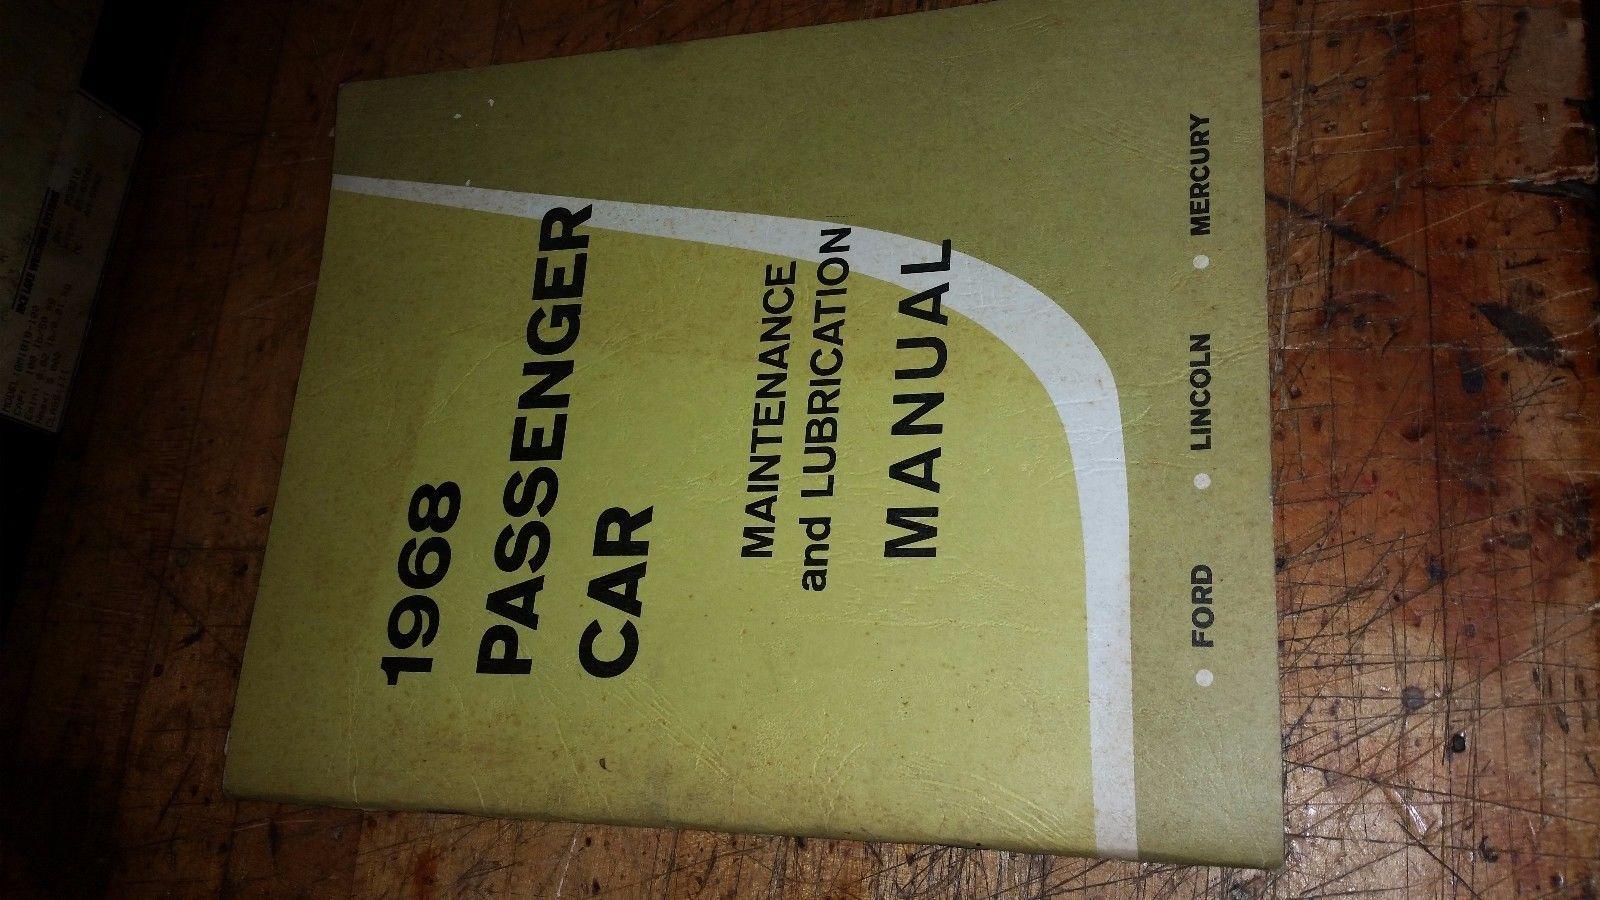 1968 Cougar Fairlane Falcon Montego Mustang Shop Manual Repair Maintenance Book